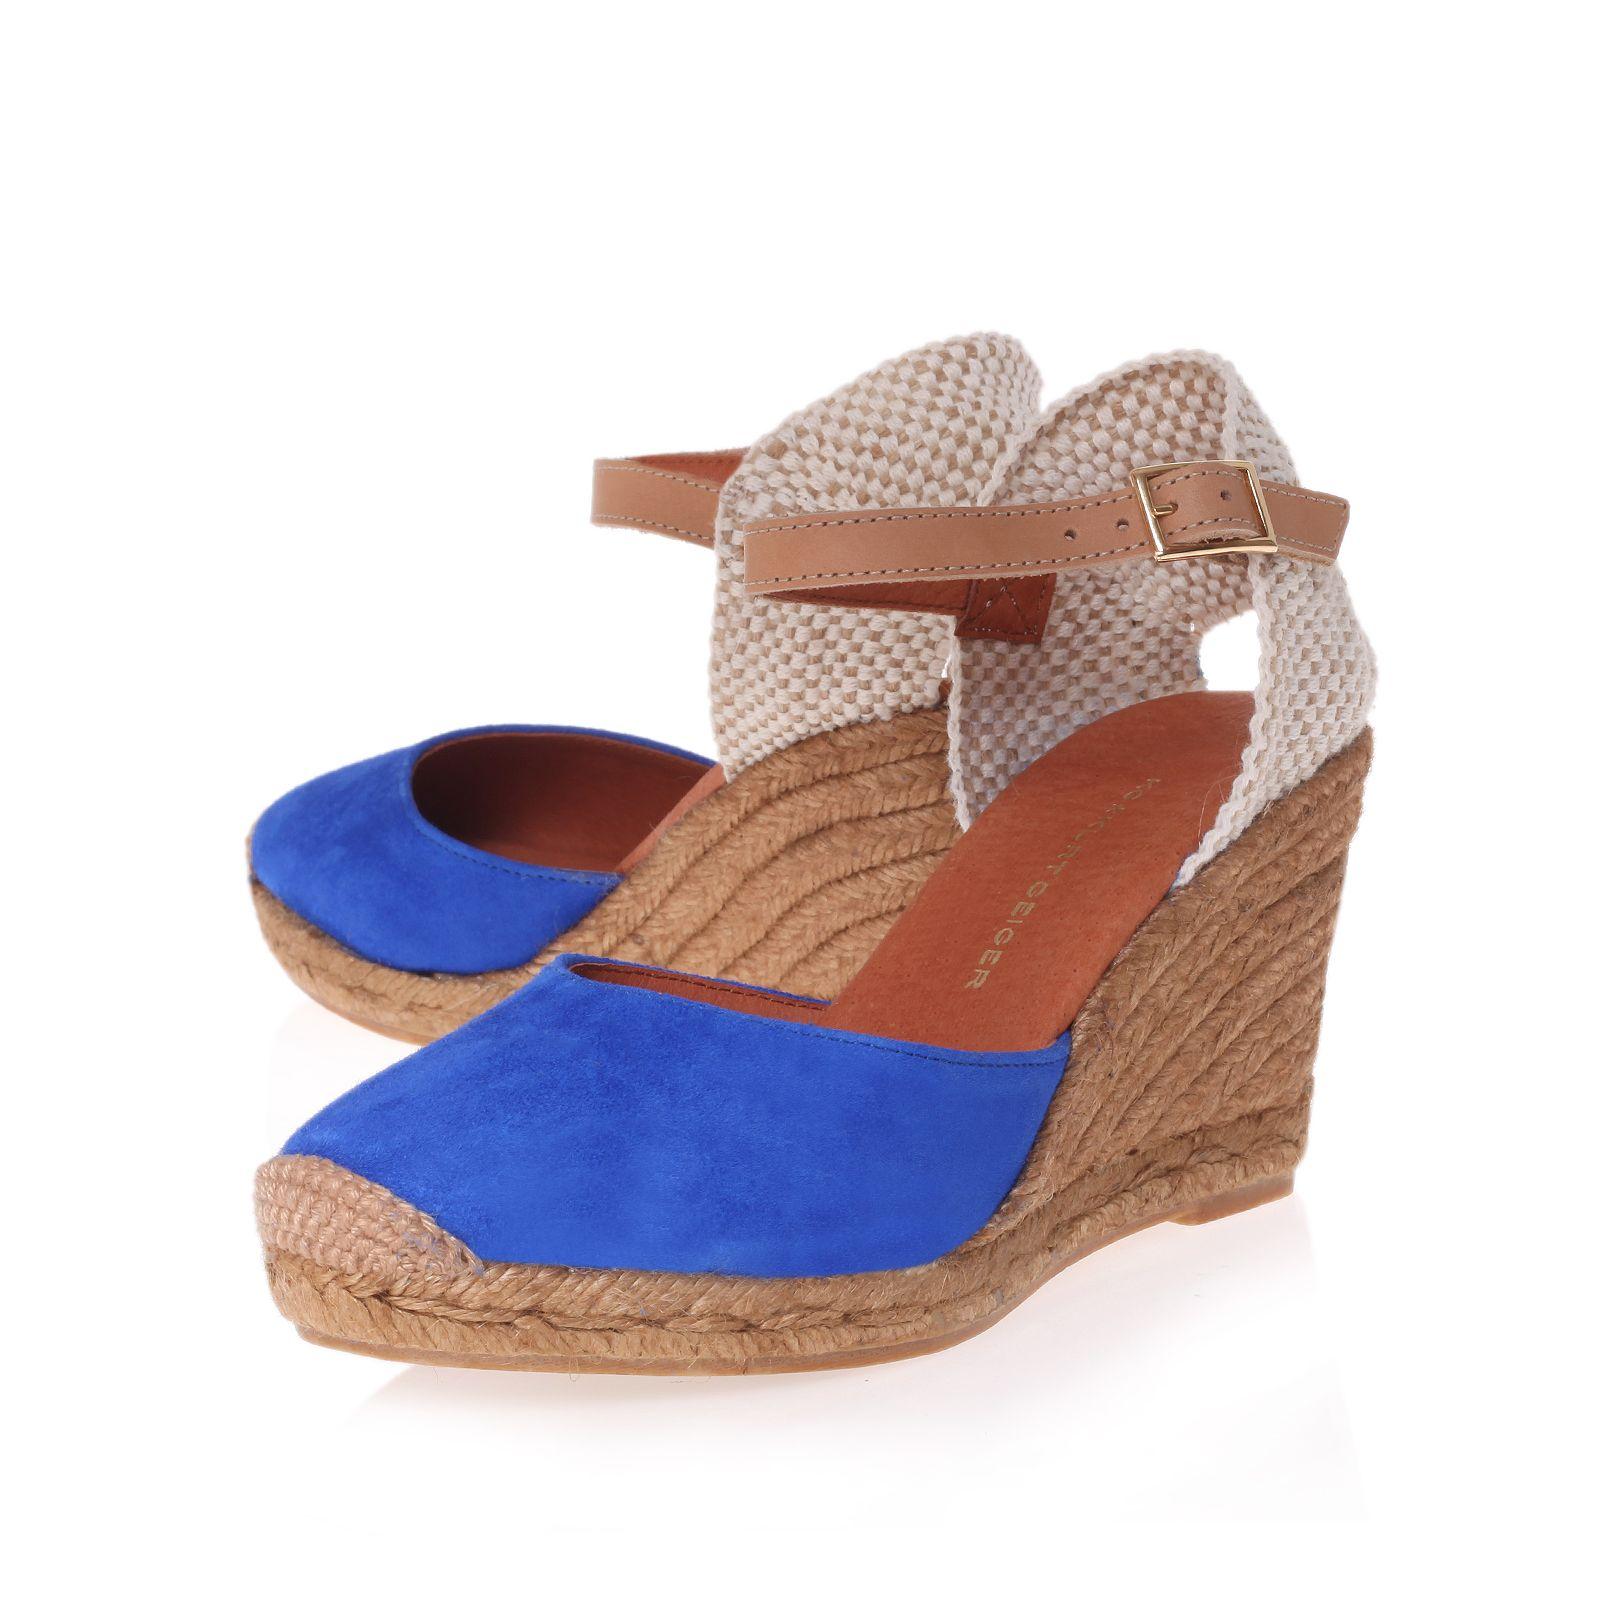 kg by kurt geiger monty wedge espadrille shoes in blue lyst